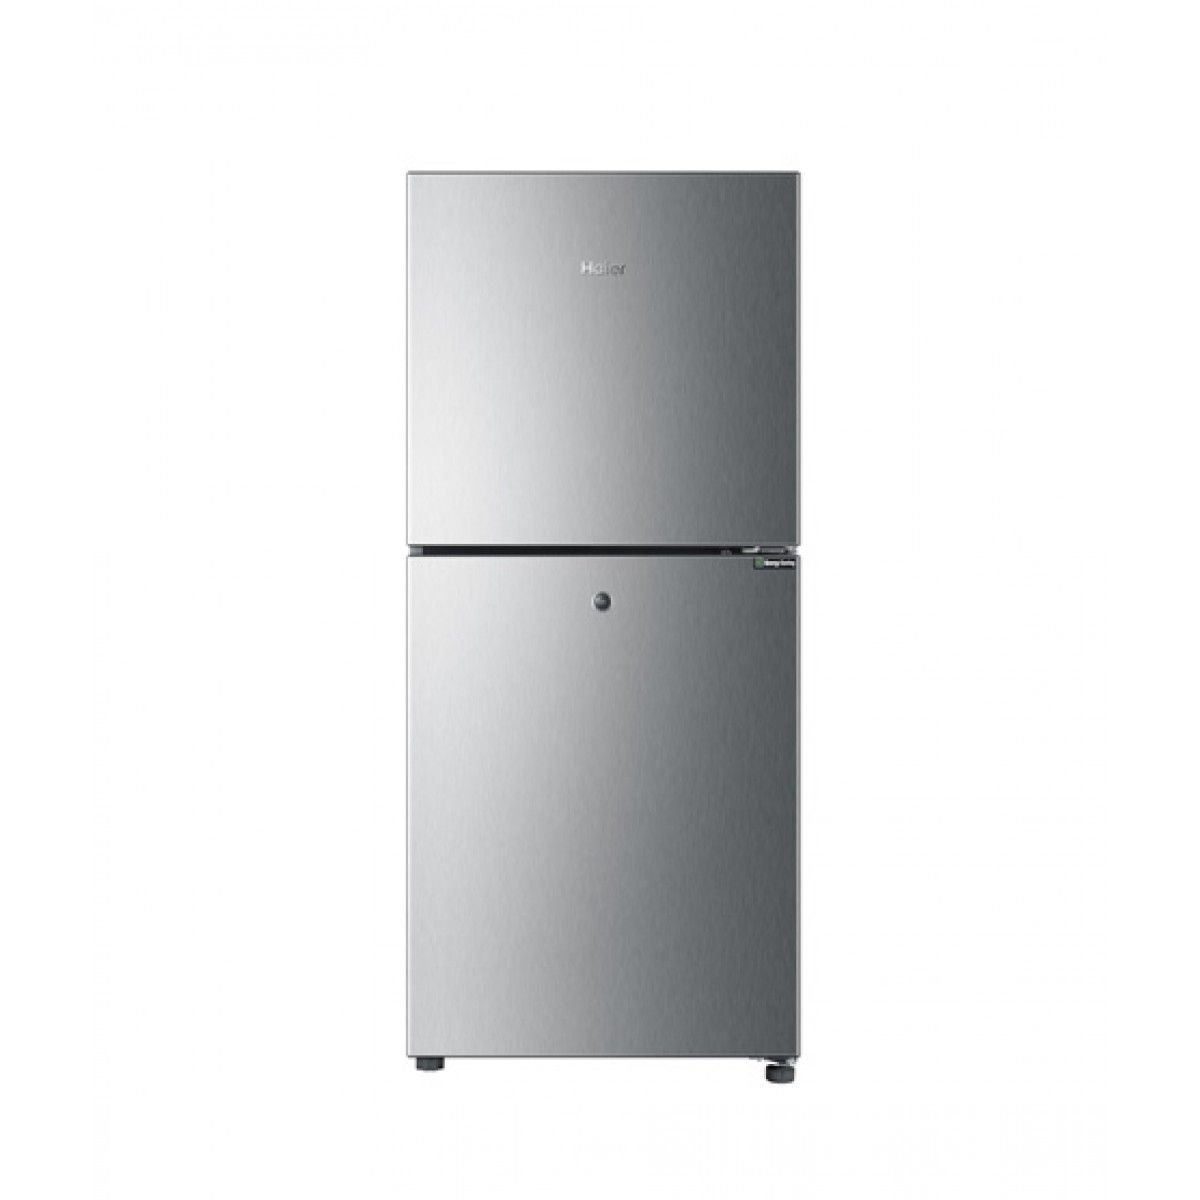 Haier HRF-216EBS 7 Cu Ft Refrigerator